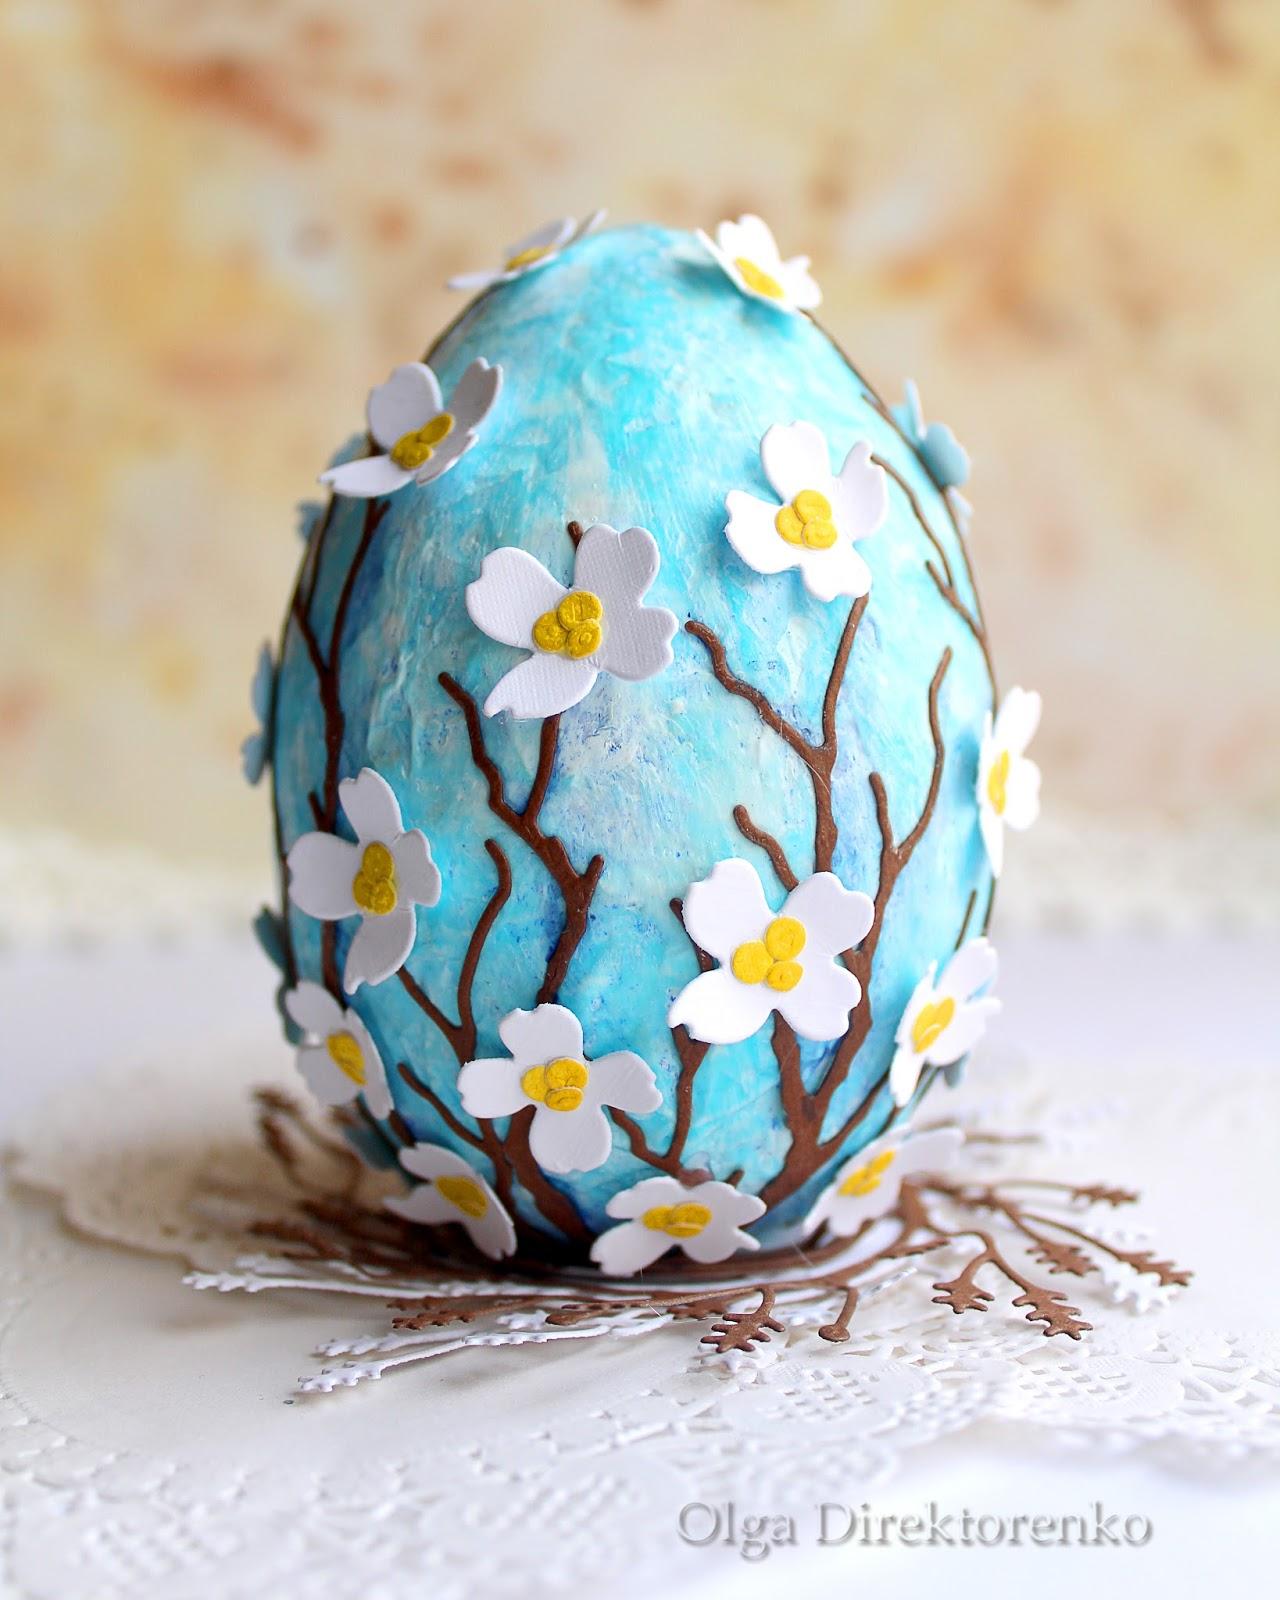 Building Your World Easter Egg Decoration